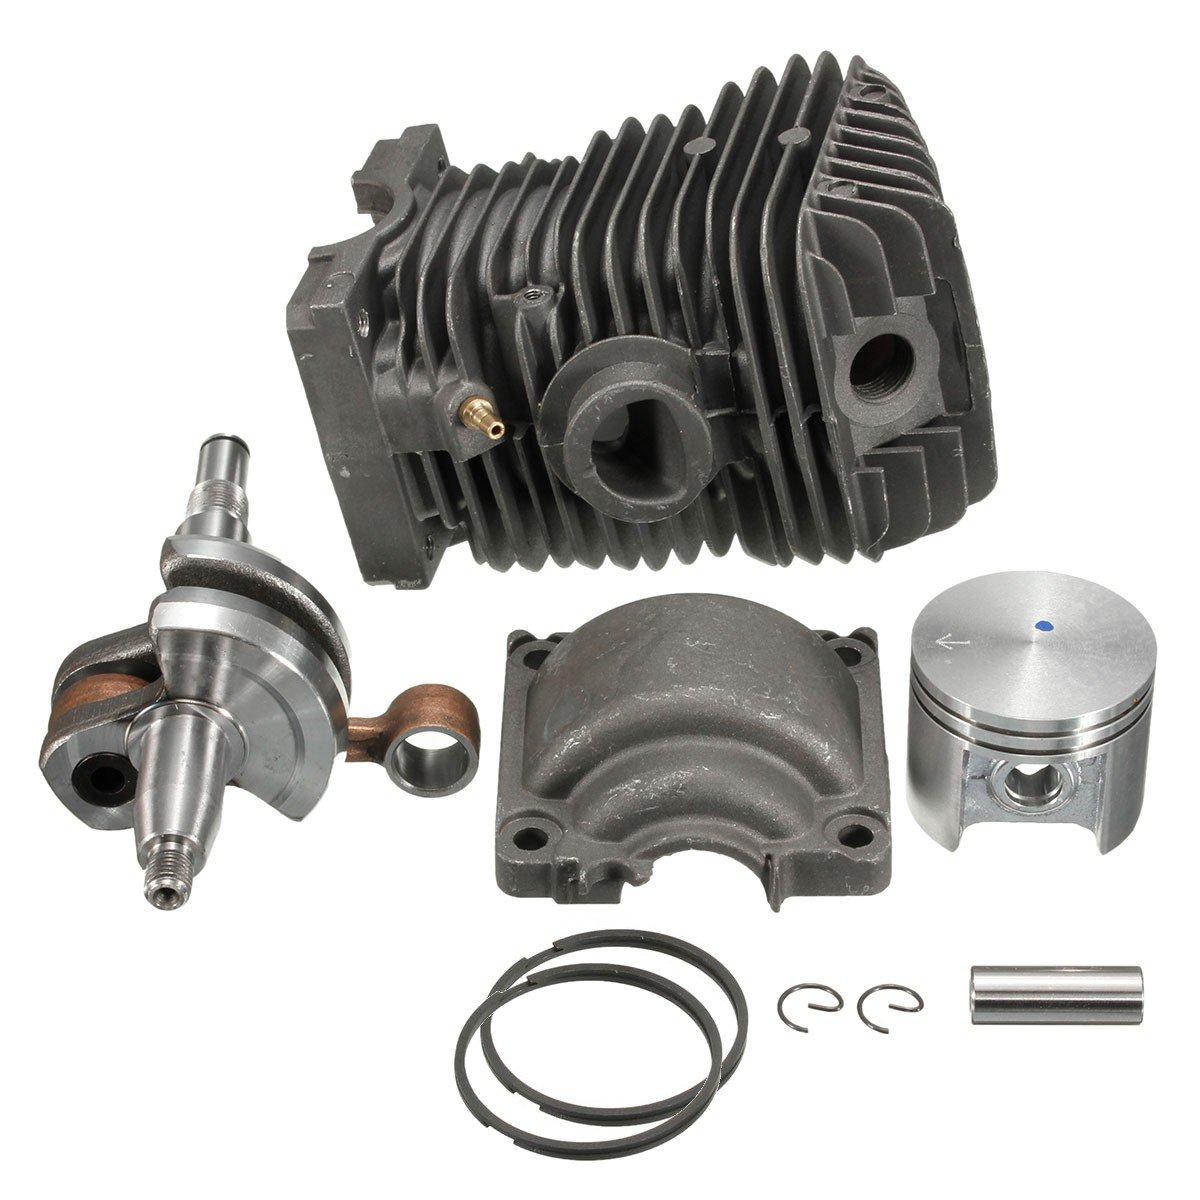 42.5mm Engine Motor For STIHL MS250 Cylinder Piston Crankshaft Chain Saw For Stihl 023 025 MS230 MS25 11230201209 11230300408